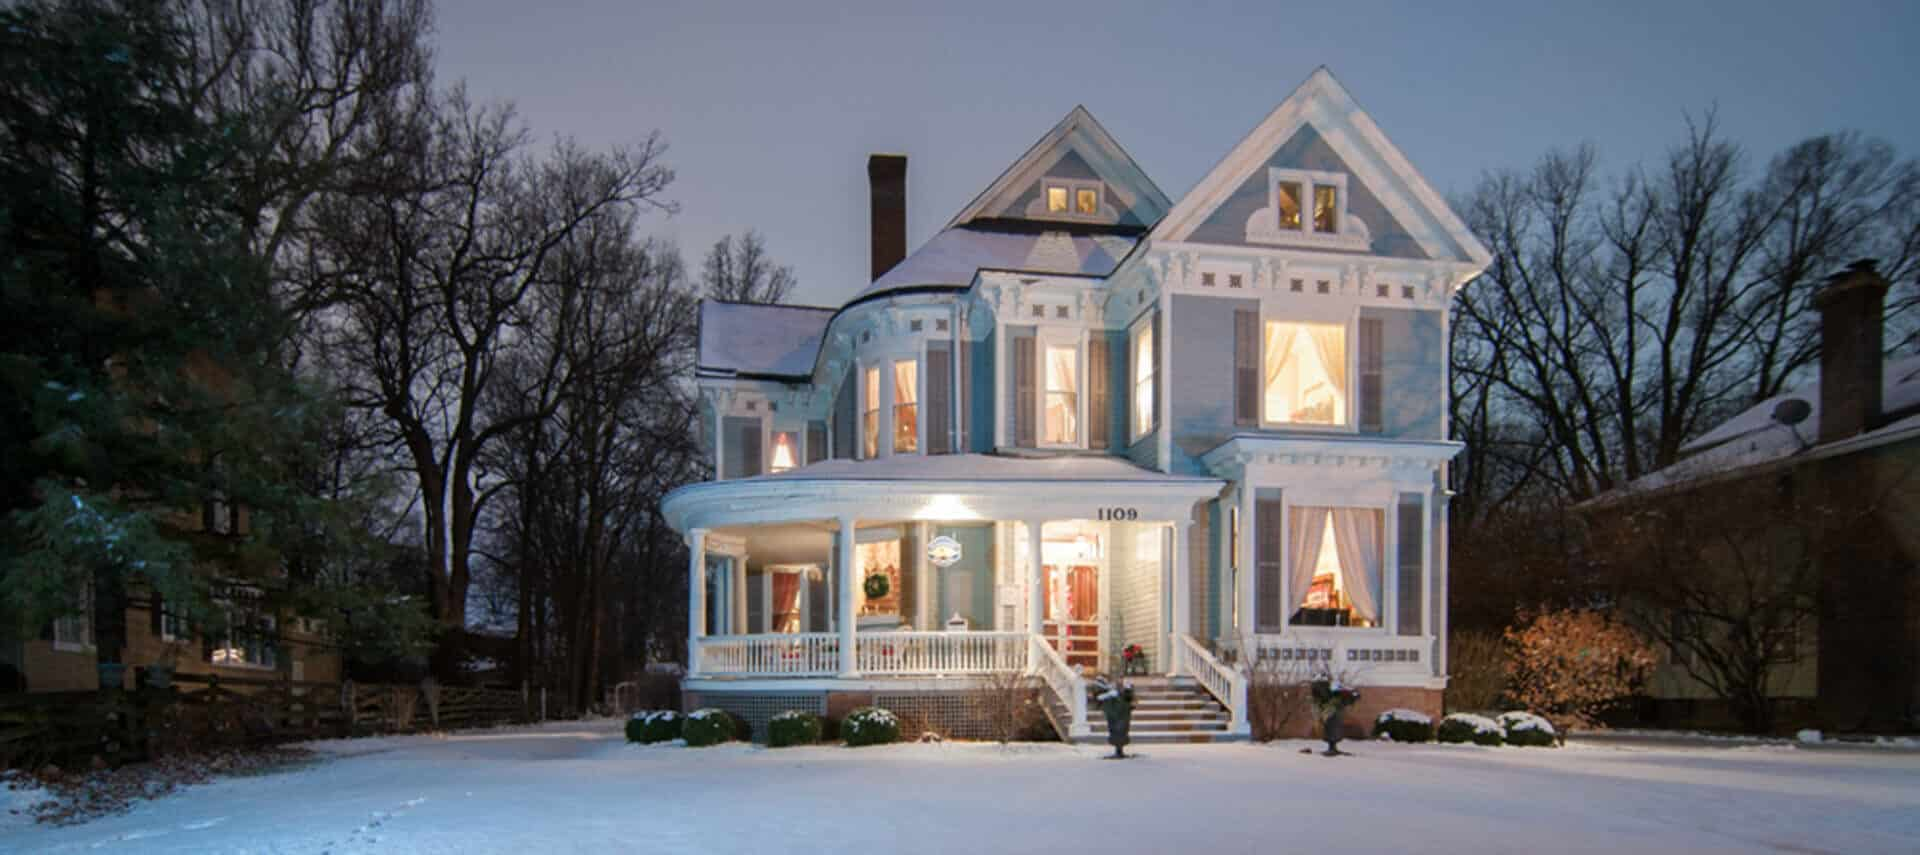 lights illuminate a vintage blue mansion